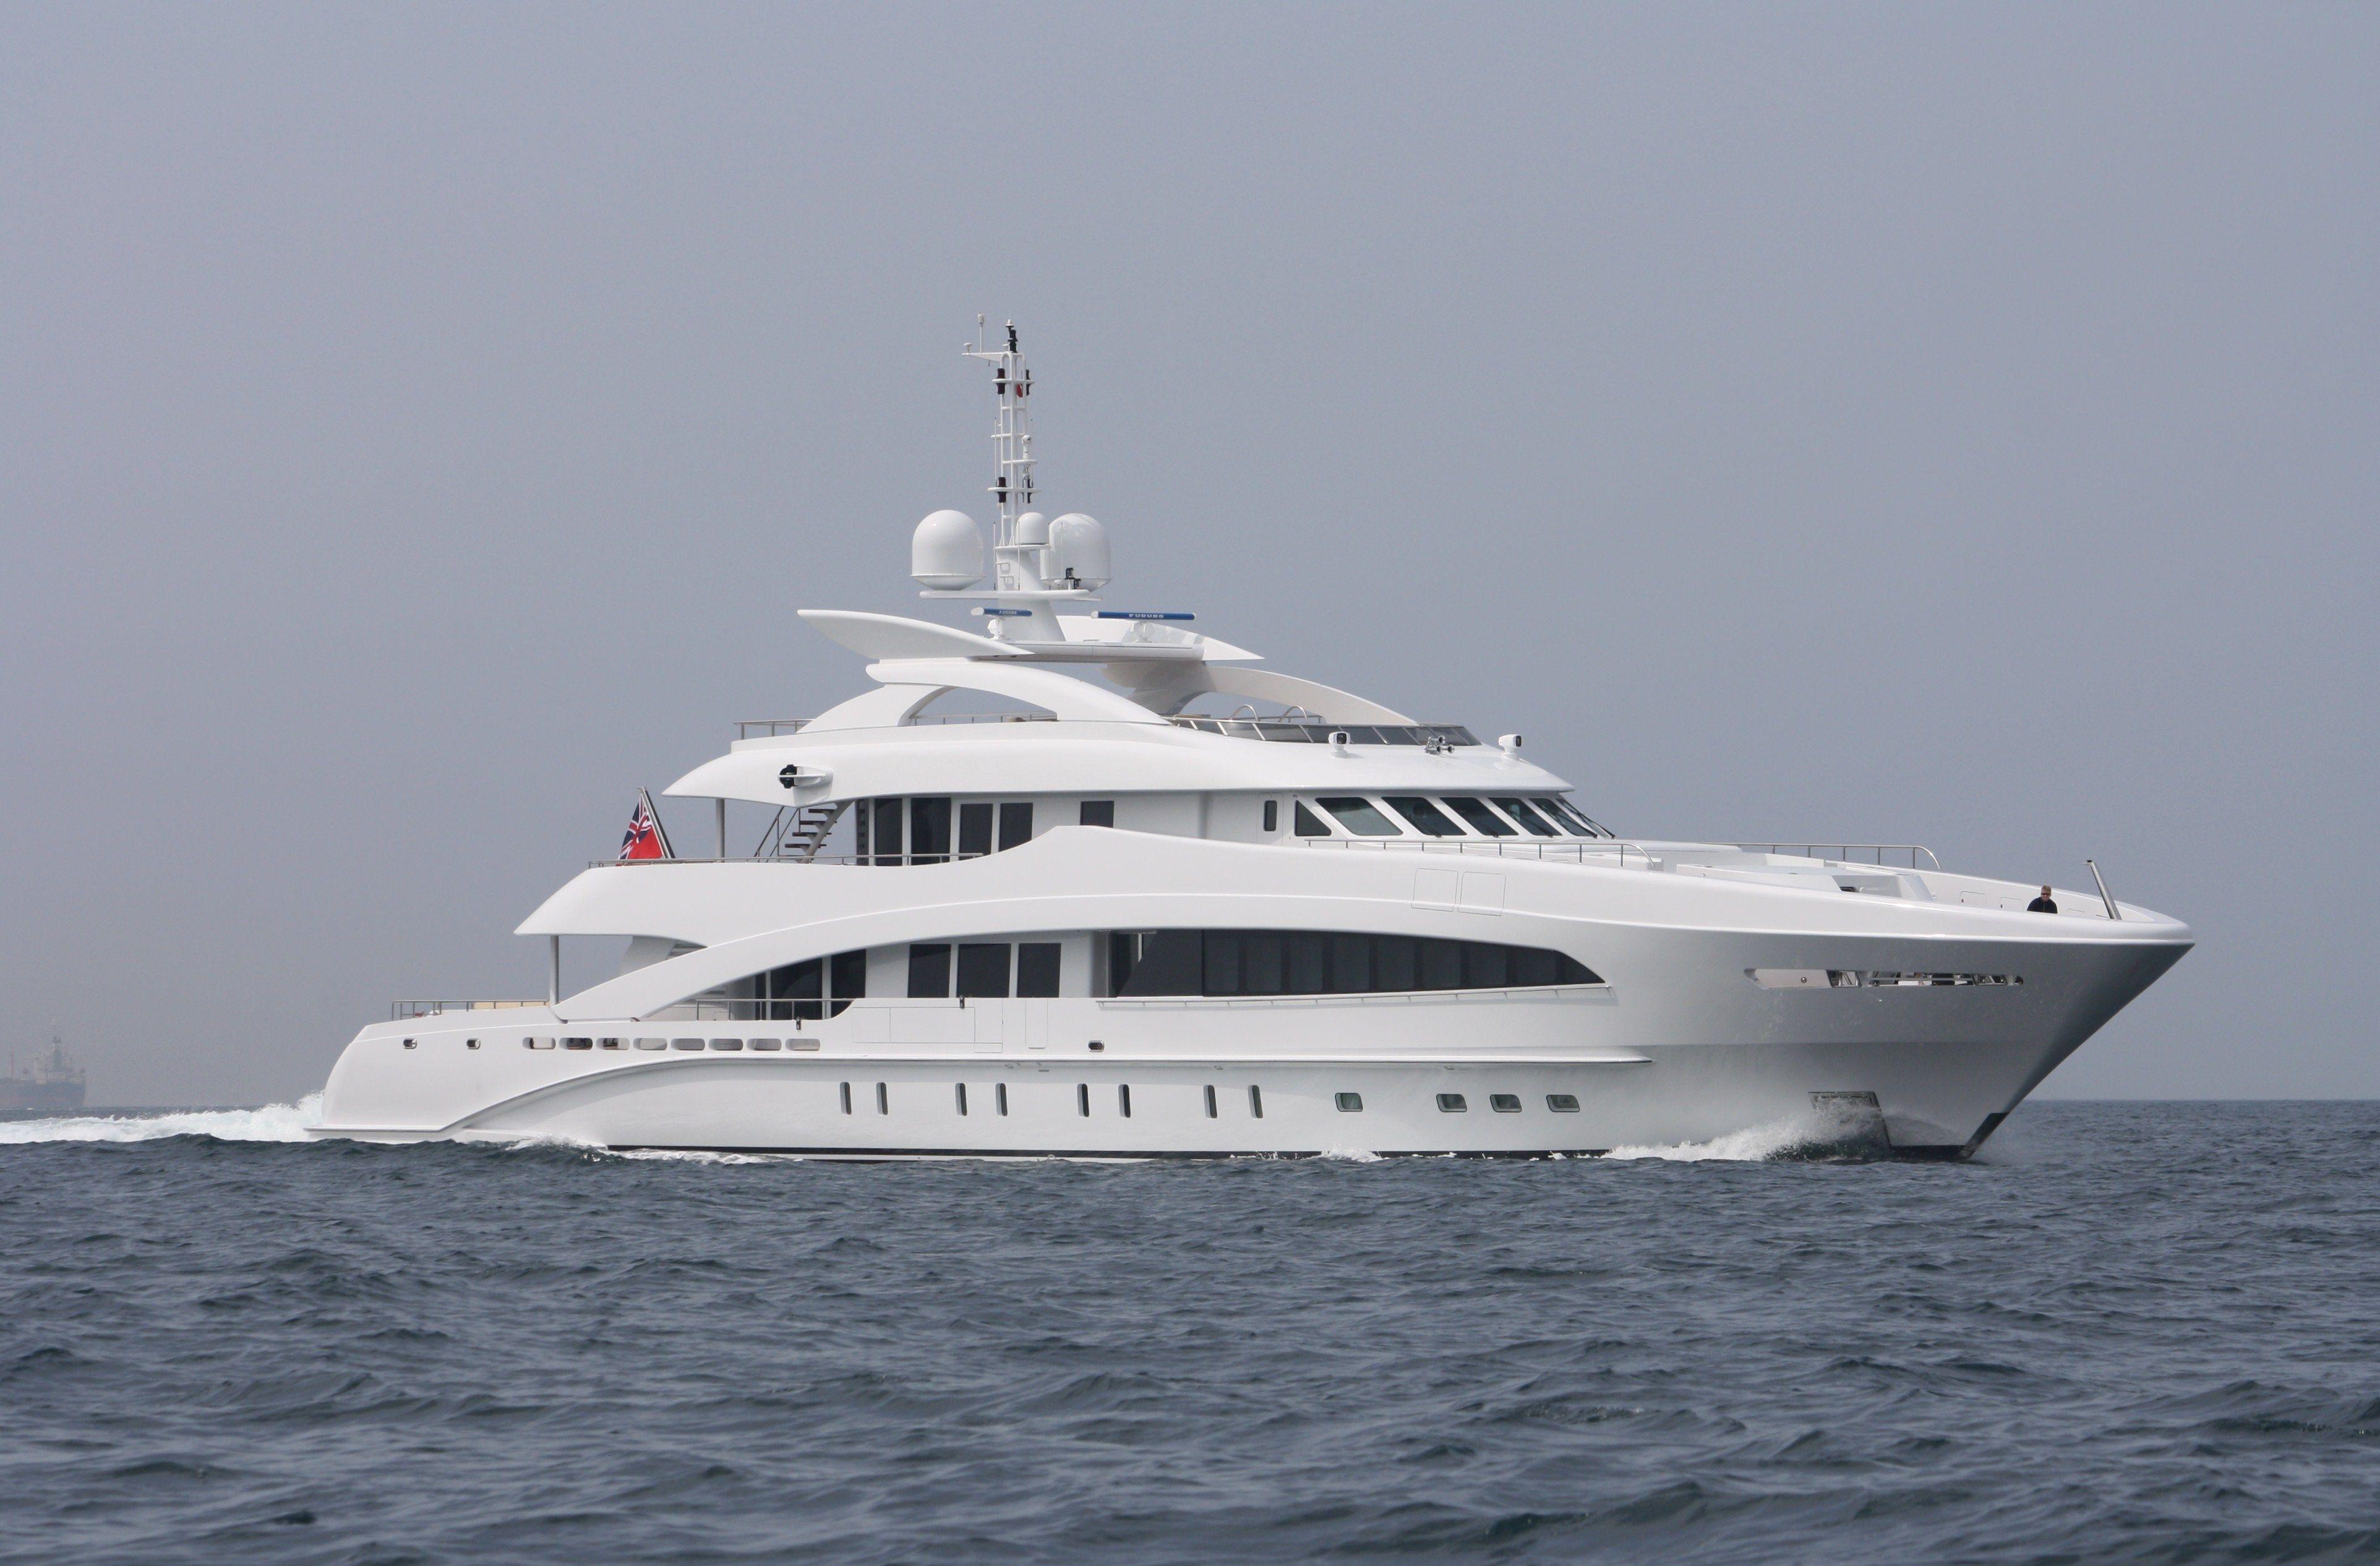 Nirvana yacht charter price oceanco luxury yacht charter - Mega Yachts 50m Super Yacht Satori By Heesen Yachts Luxury Yacht Charter Boats Pinterest Luxury Yachts Boating And Yacht Boat